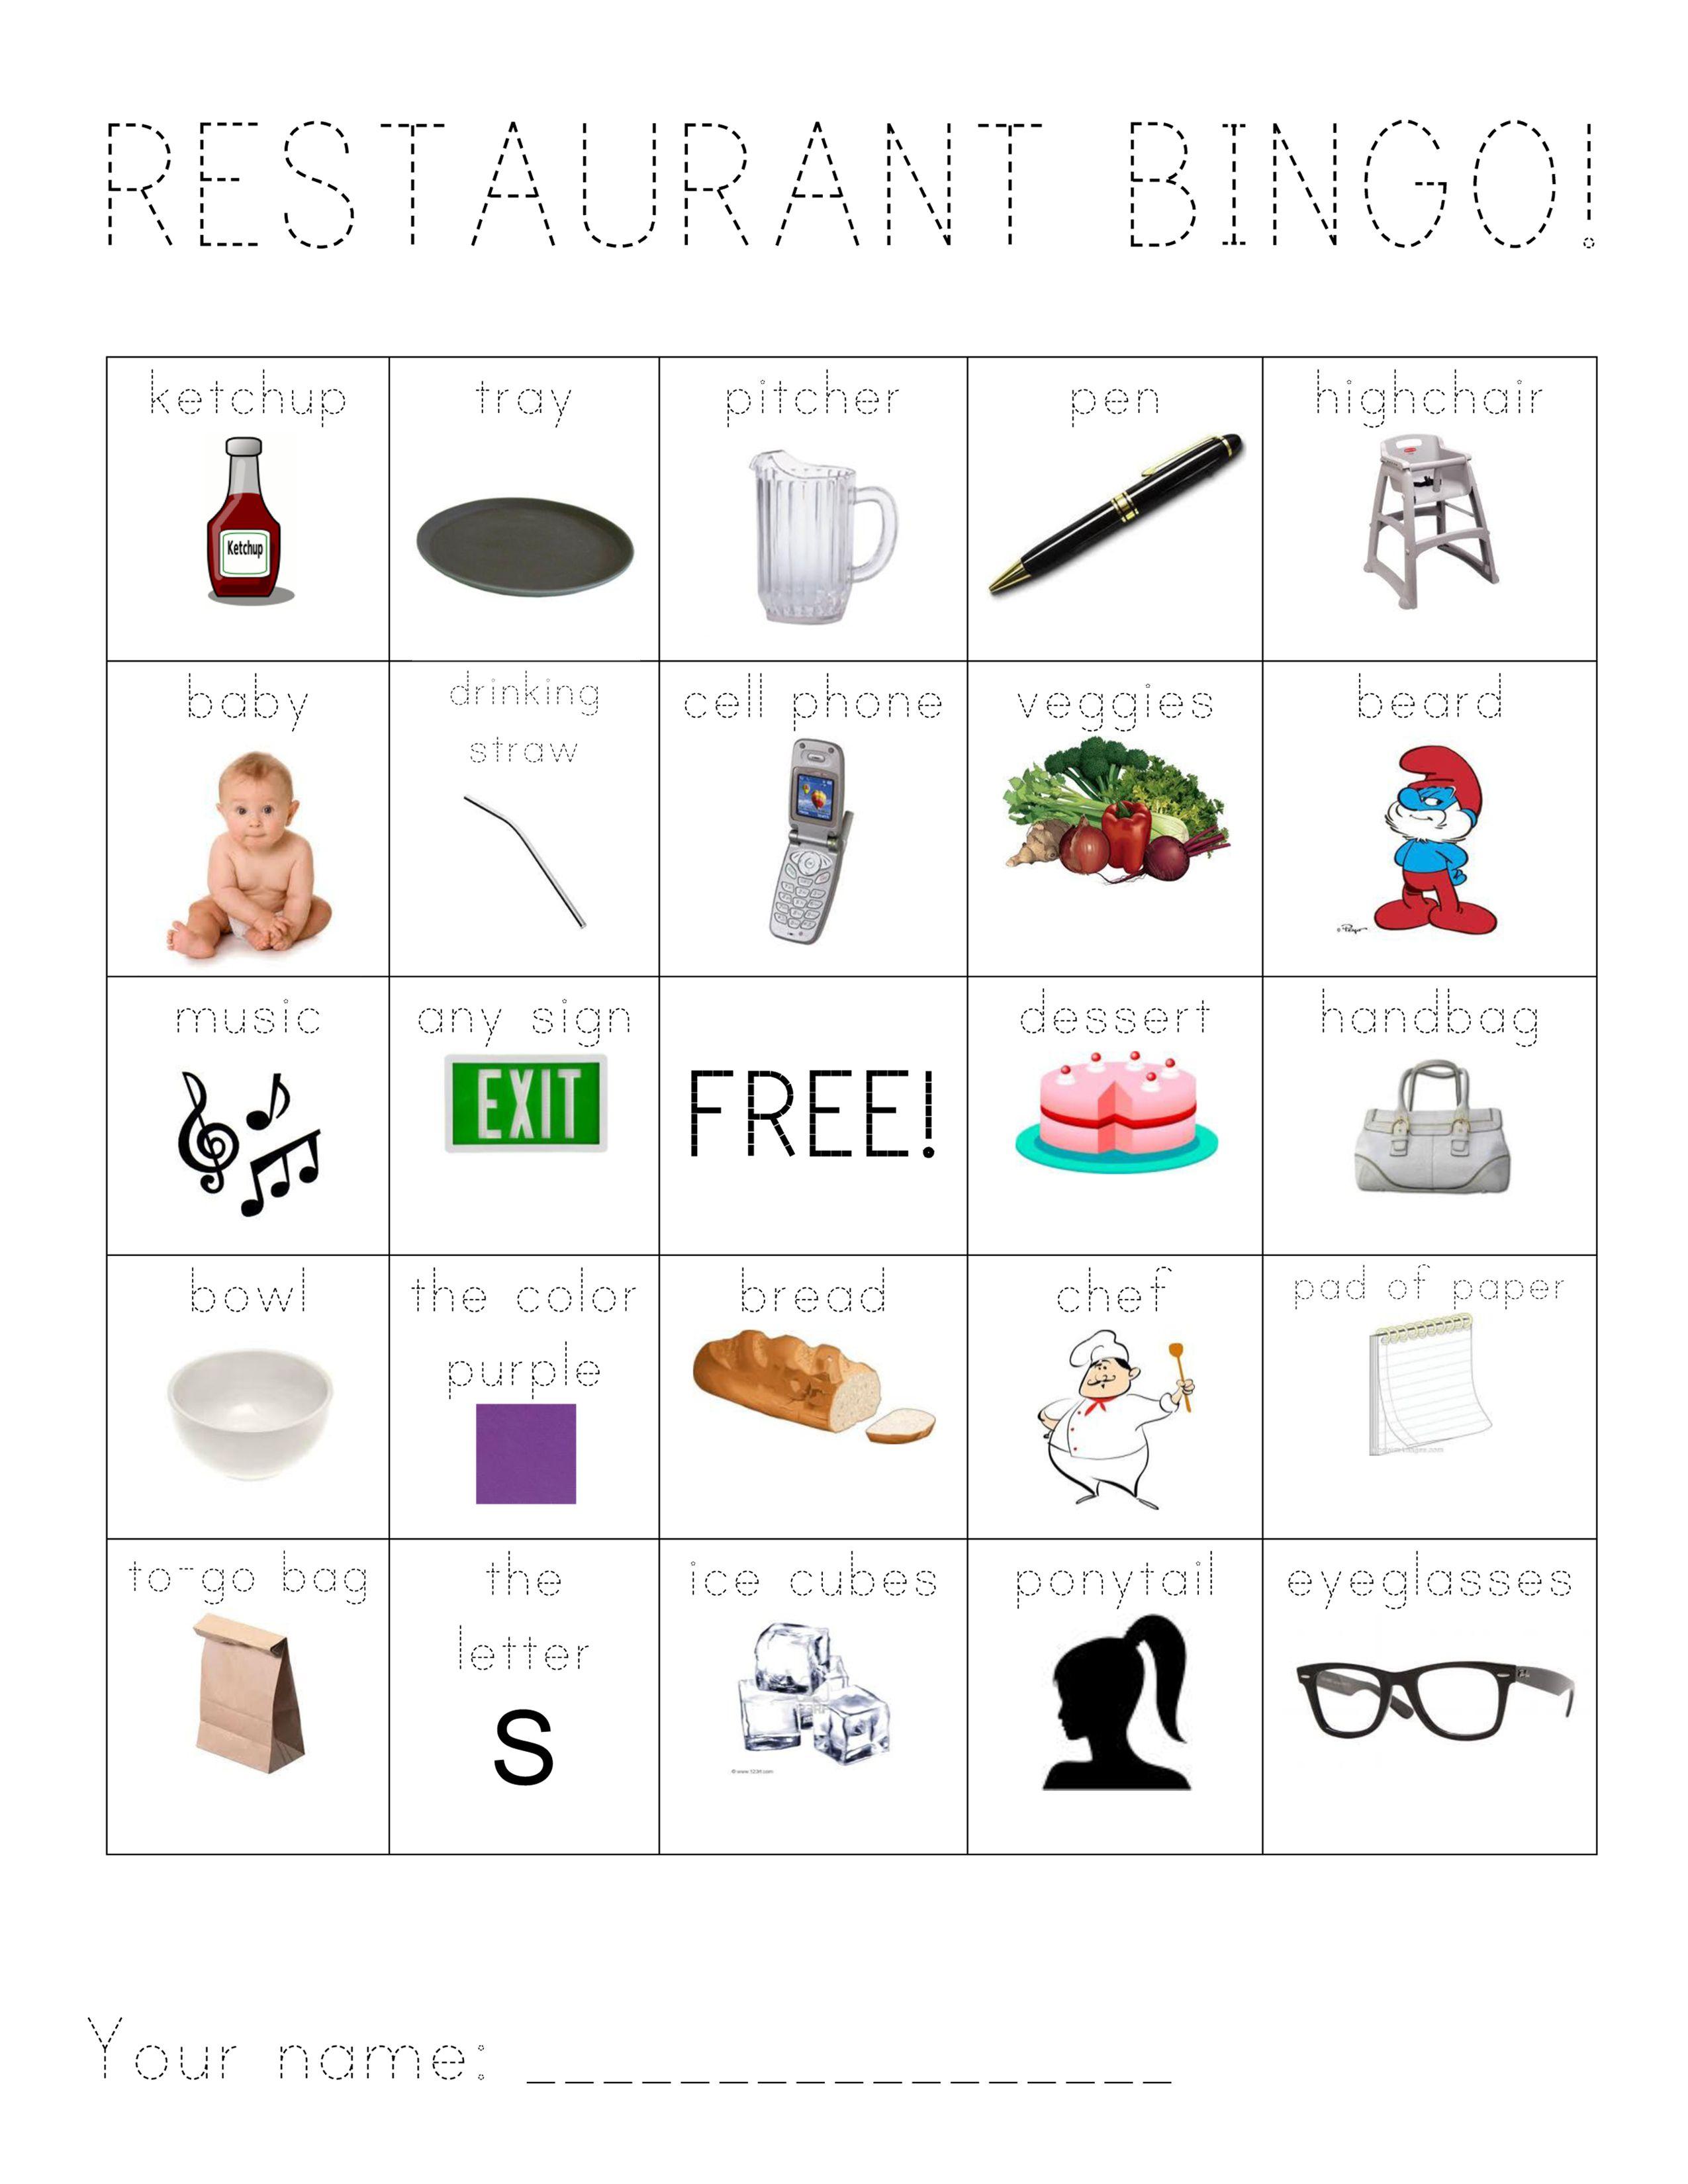 Kids Restaurant Bingo CARD ONE Medium difficulty Free Printable